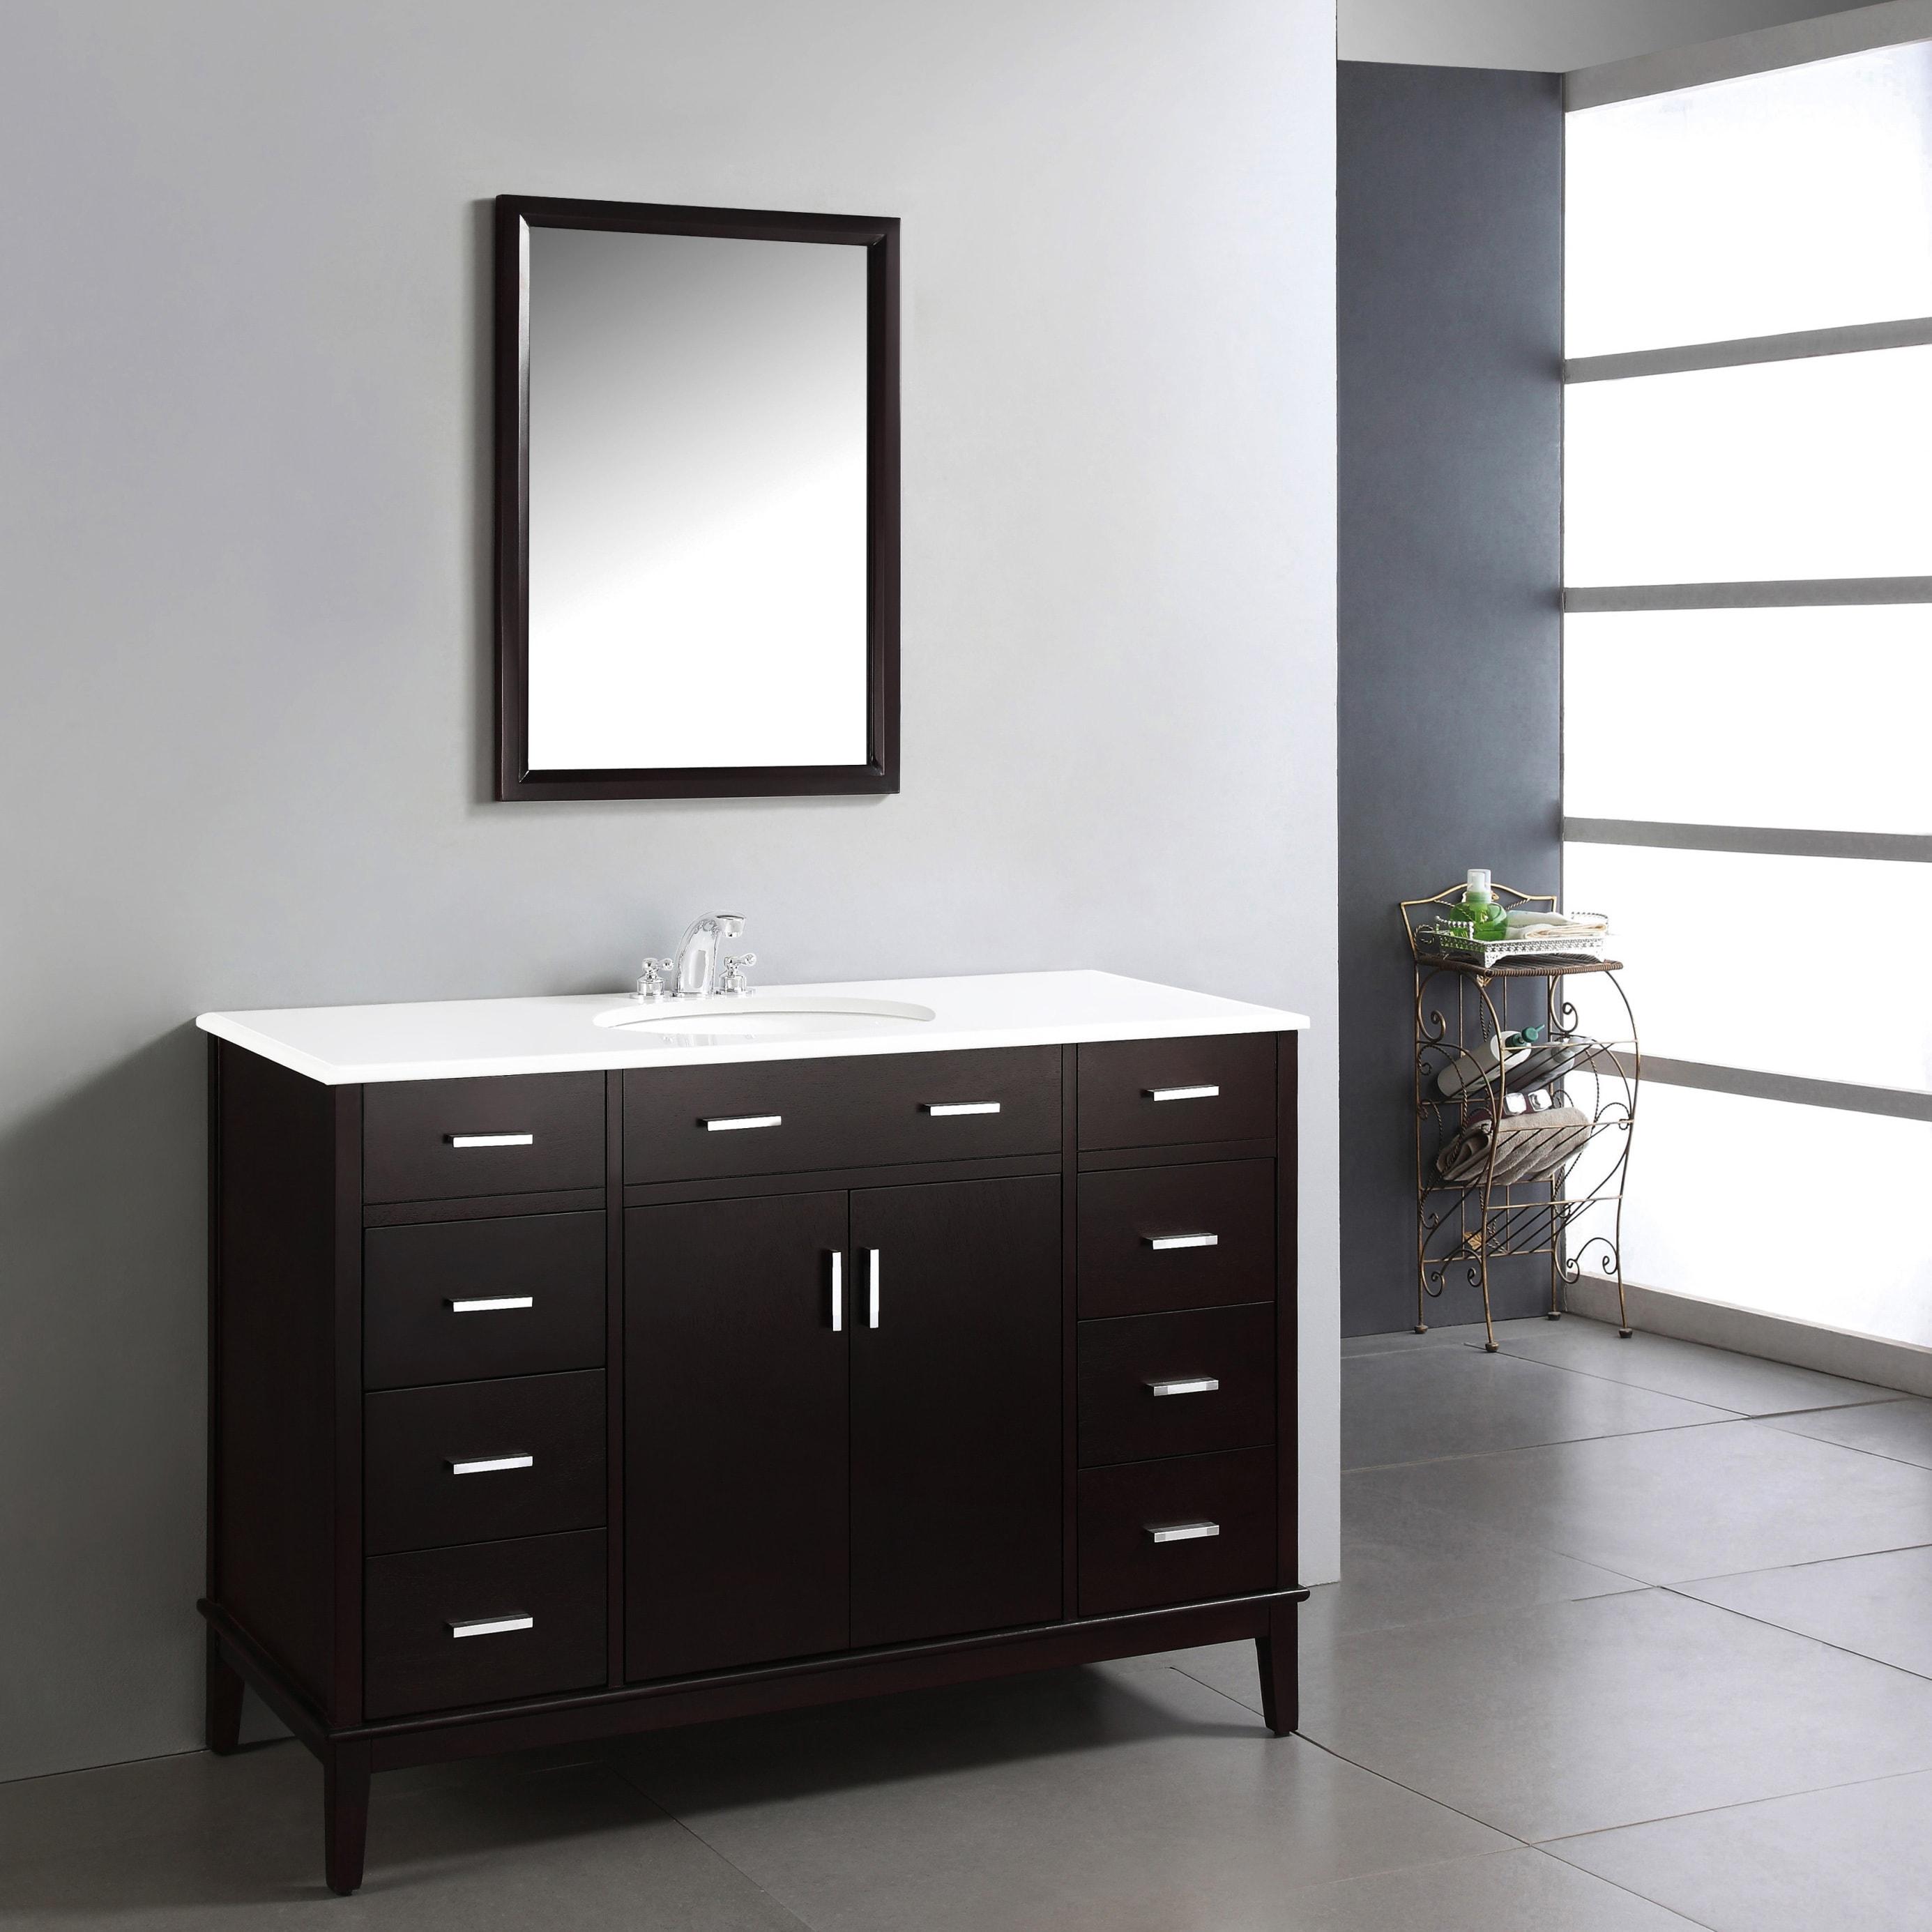 Shop WYNDENHALL Oxford Dark Espresso Brown 48-inch Bathroom Vanity ...